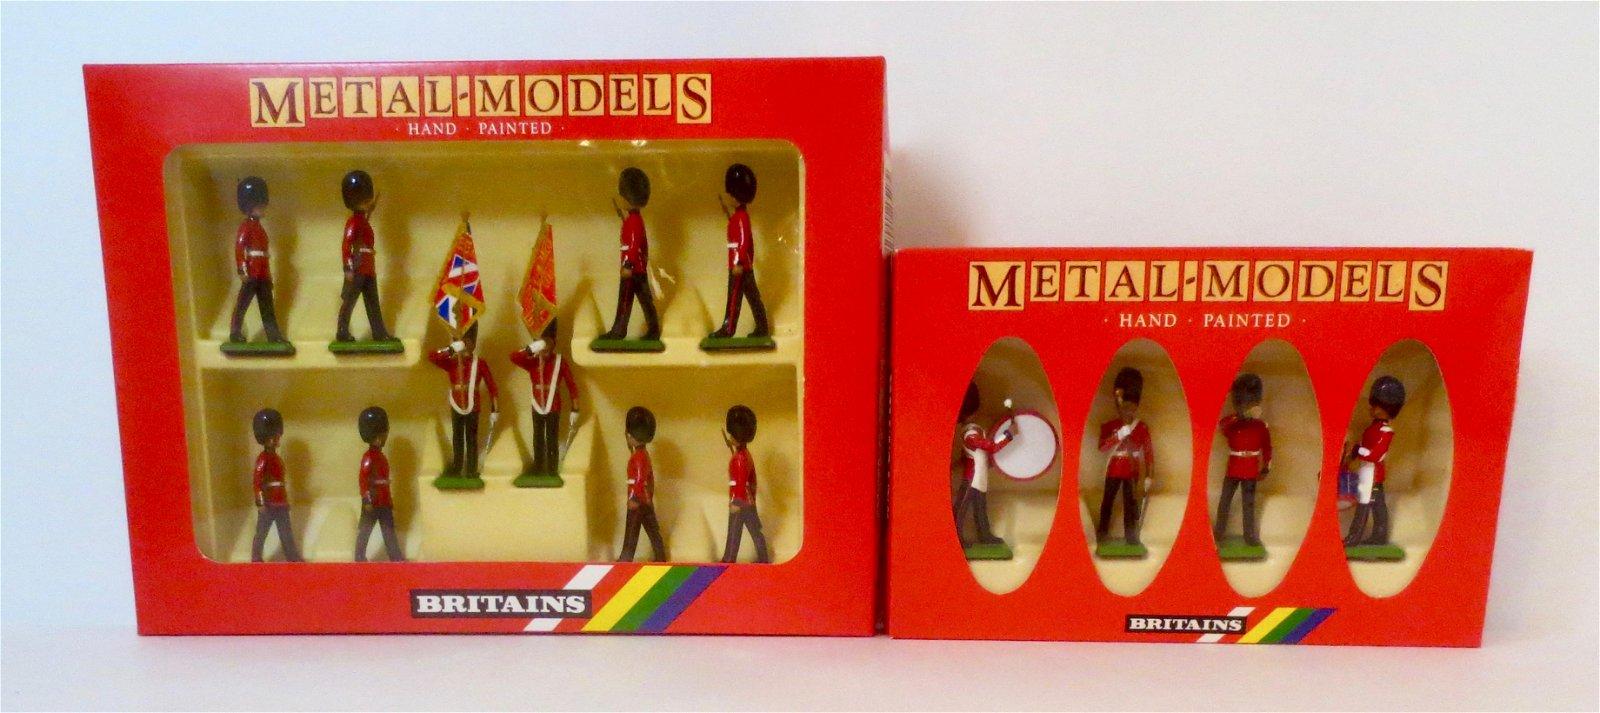 Britains Metal Models #7207 and #7210